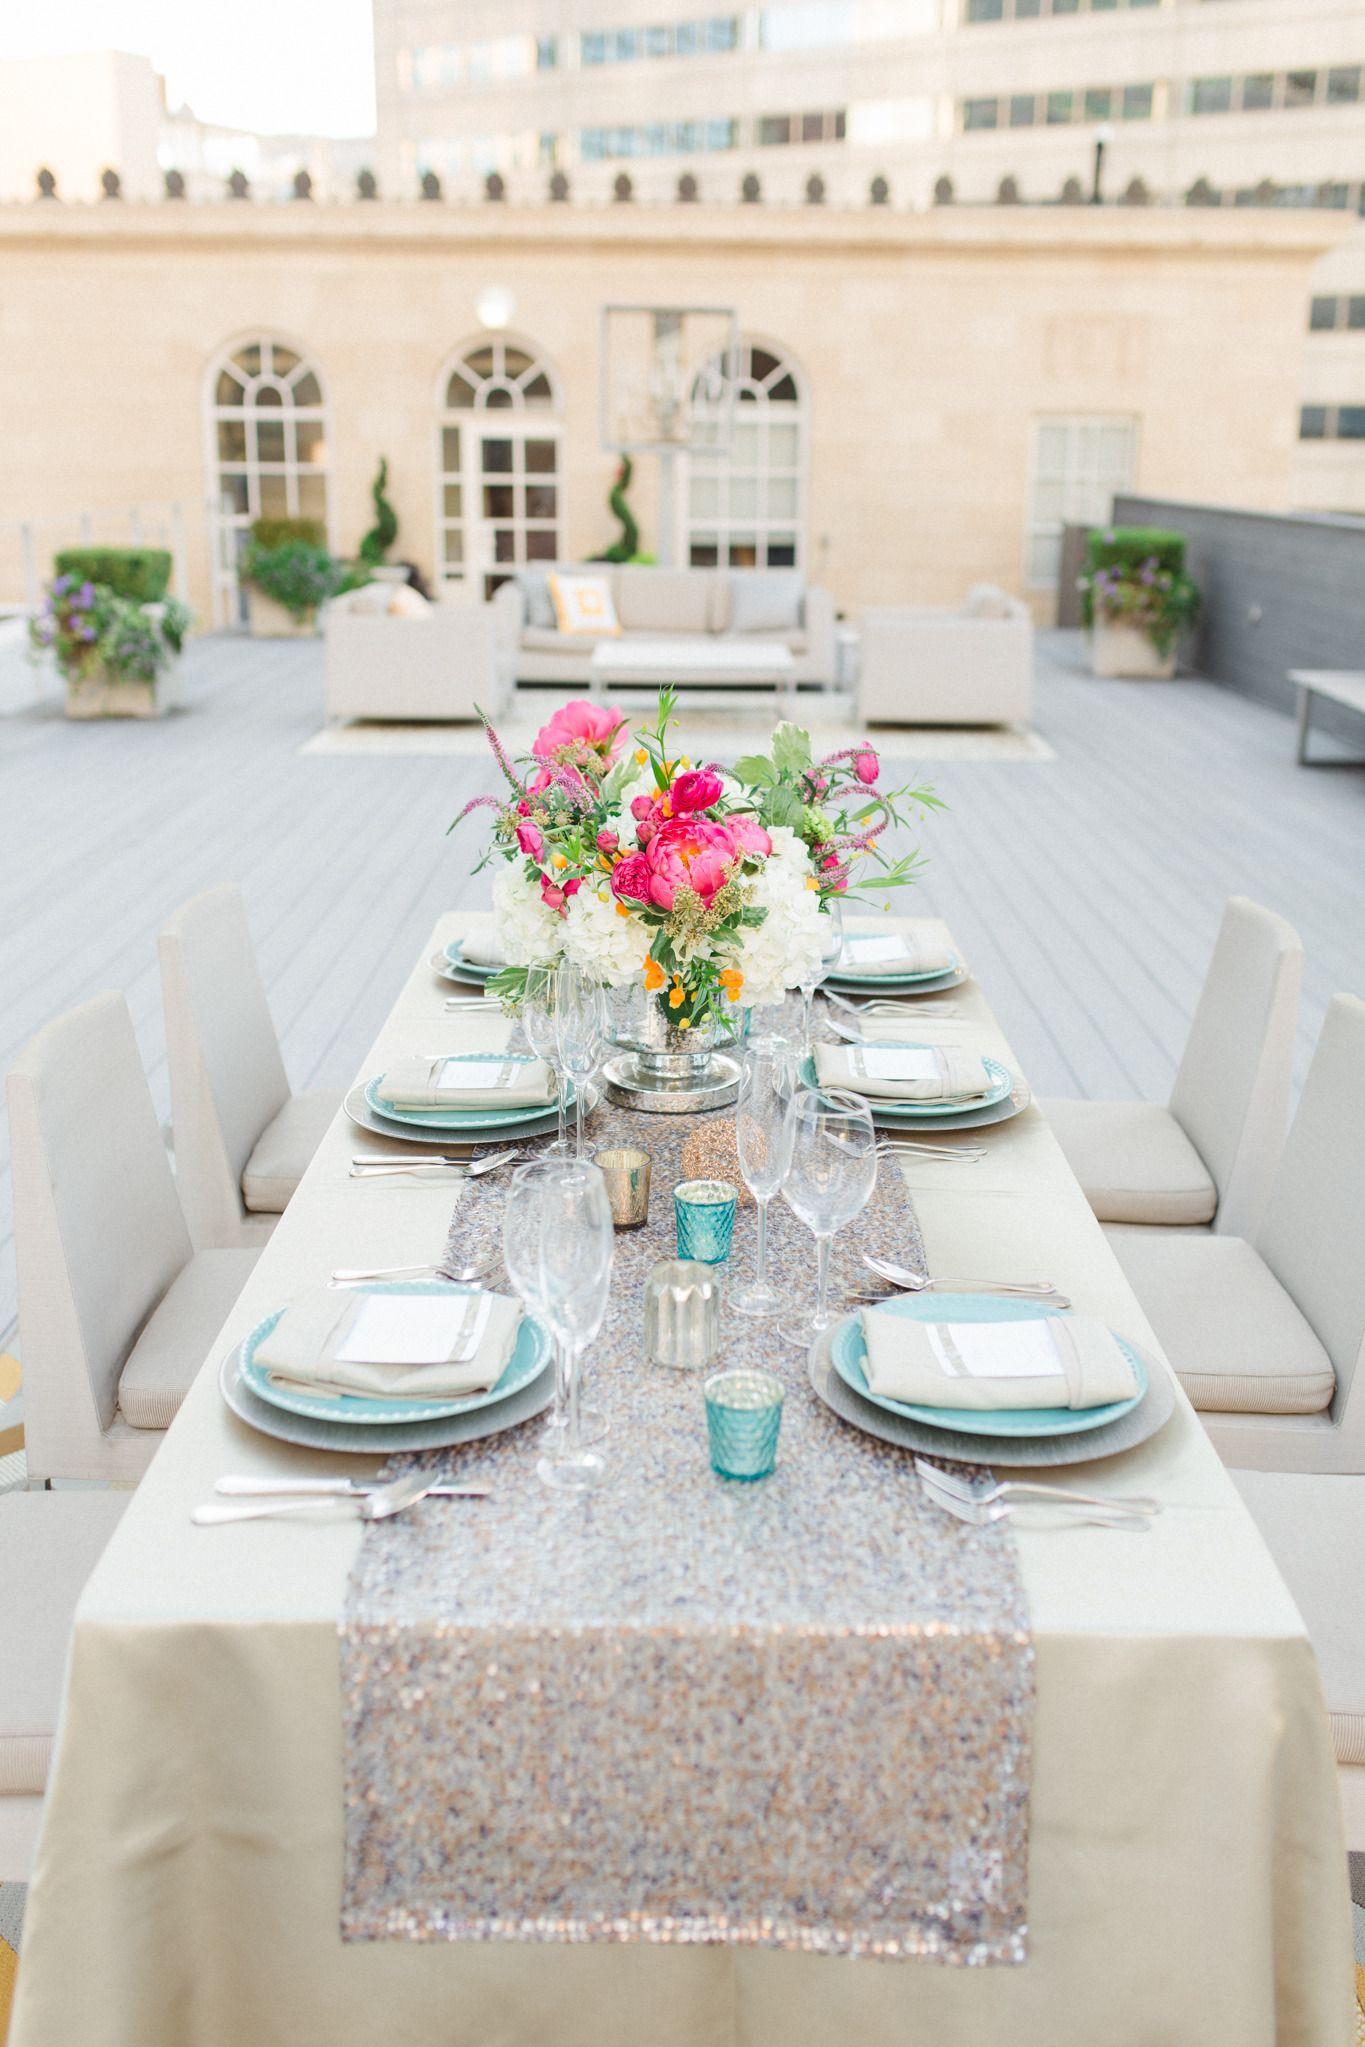 The Venue At 400 North Ervay Inspiration Shoot | Pinterest | Floral ...